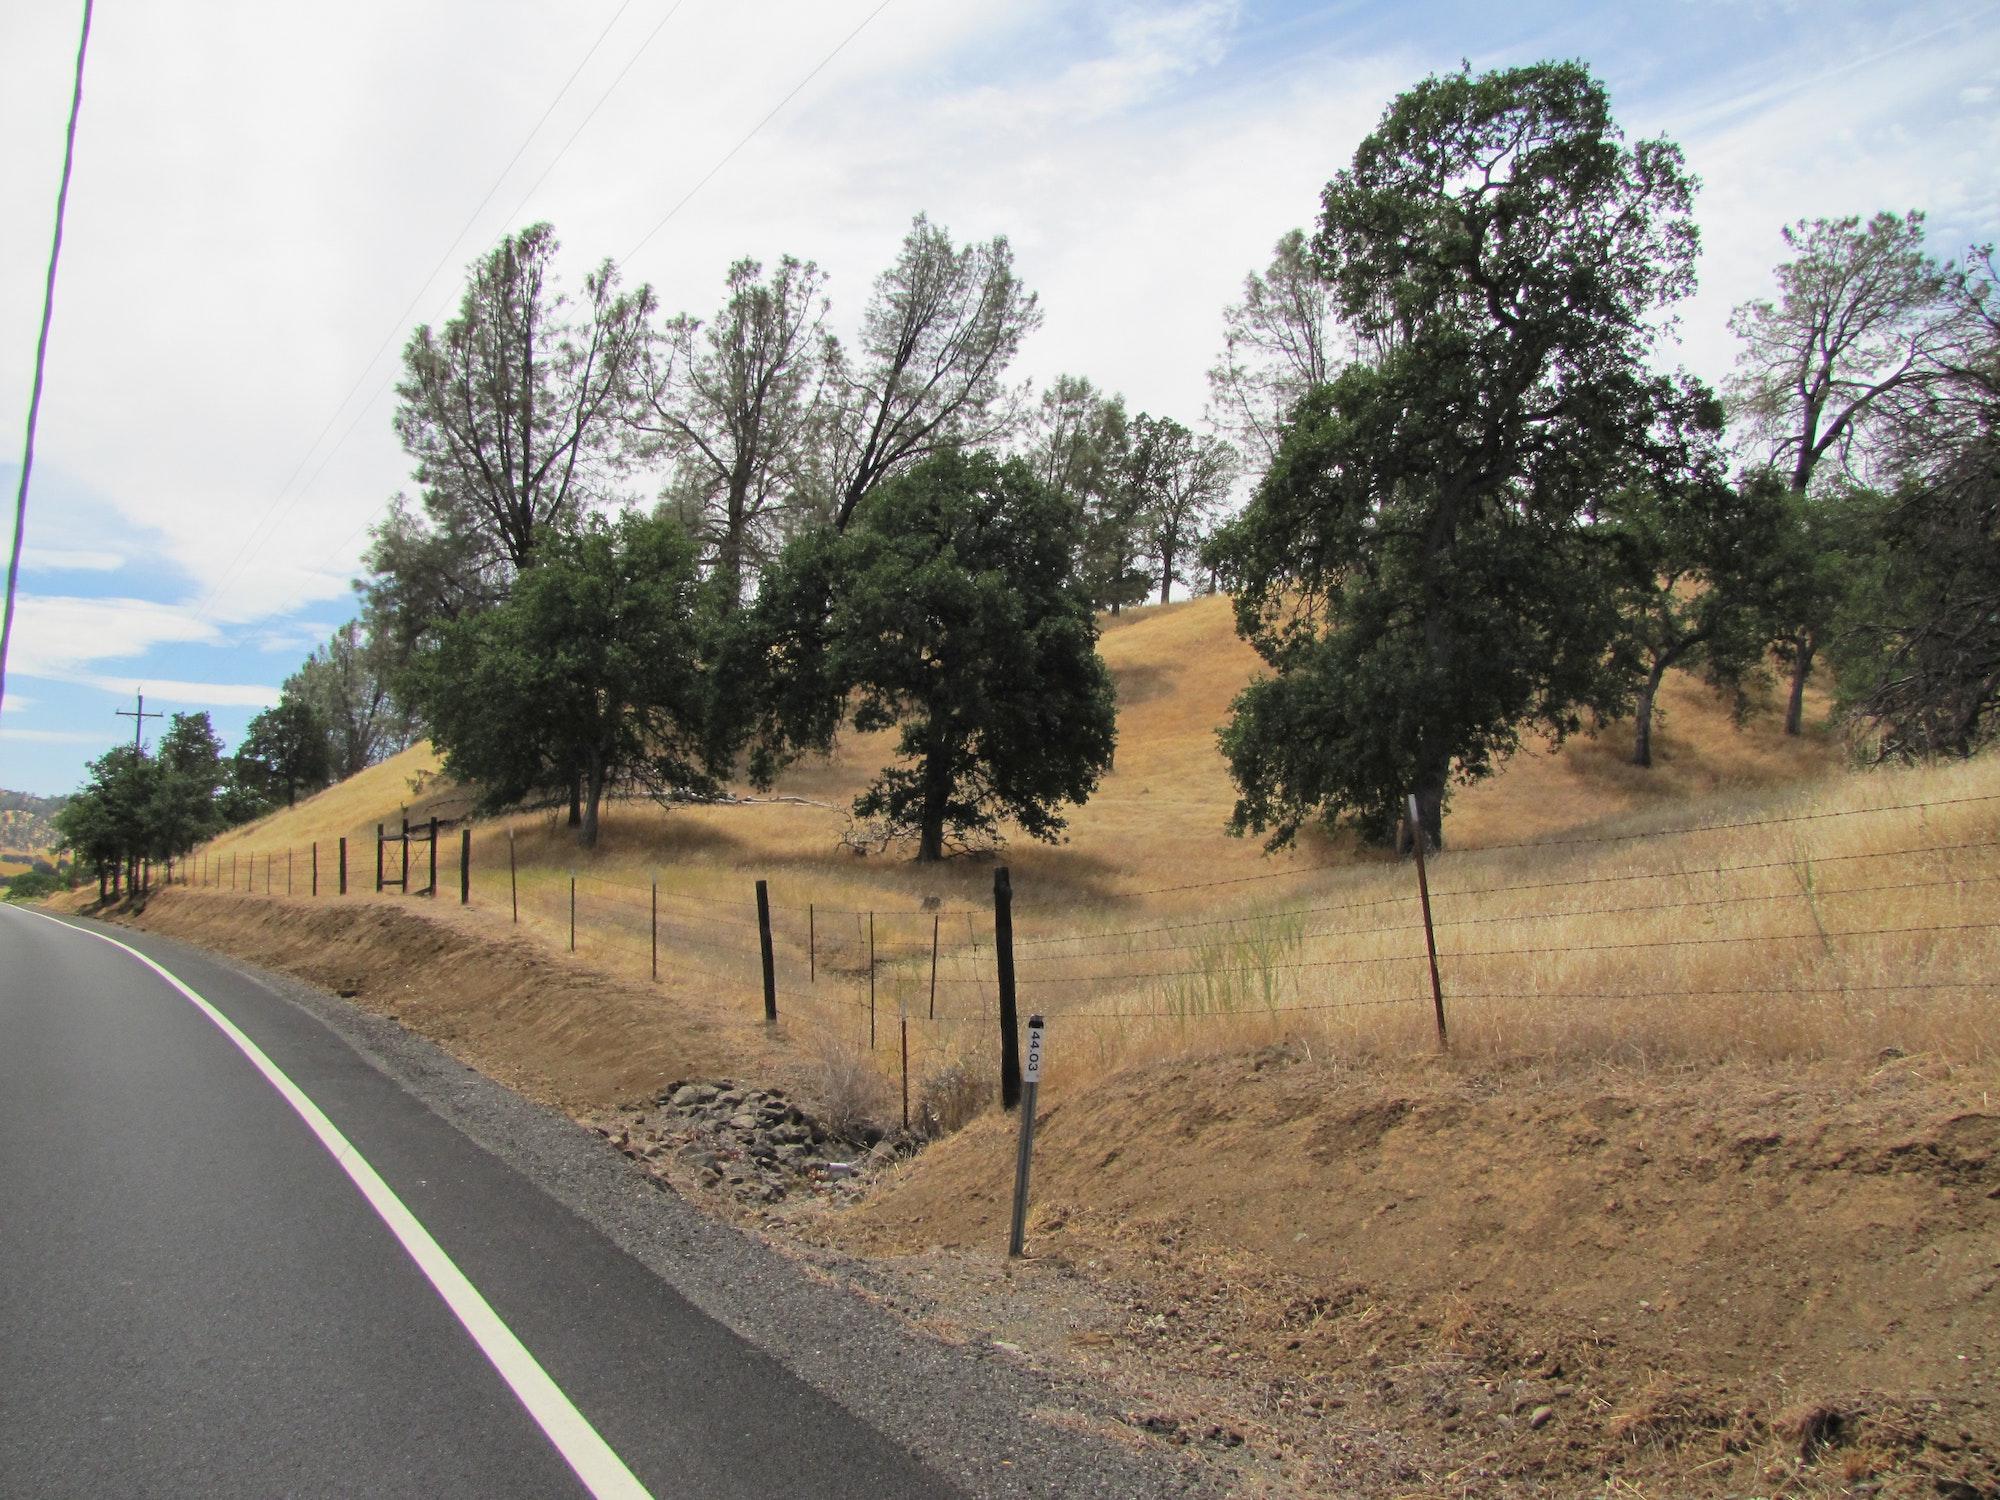 May contain: road, freeway, highway, asphalt, and tarmac